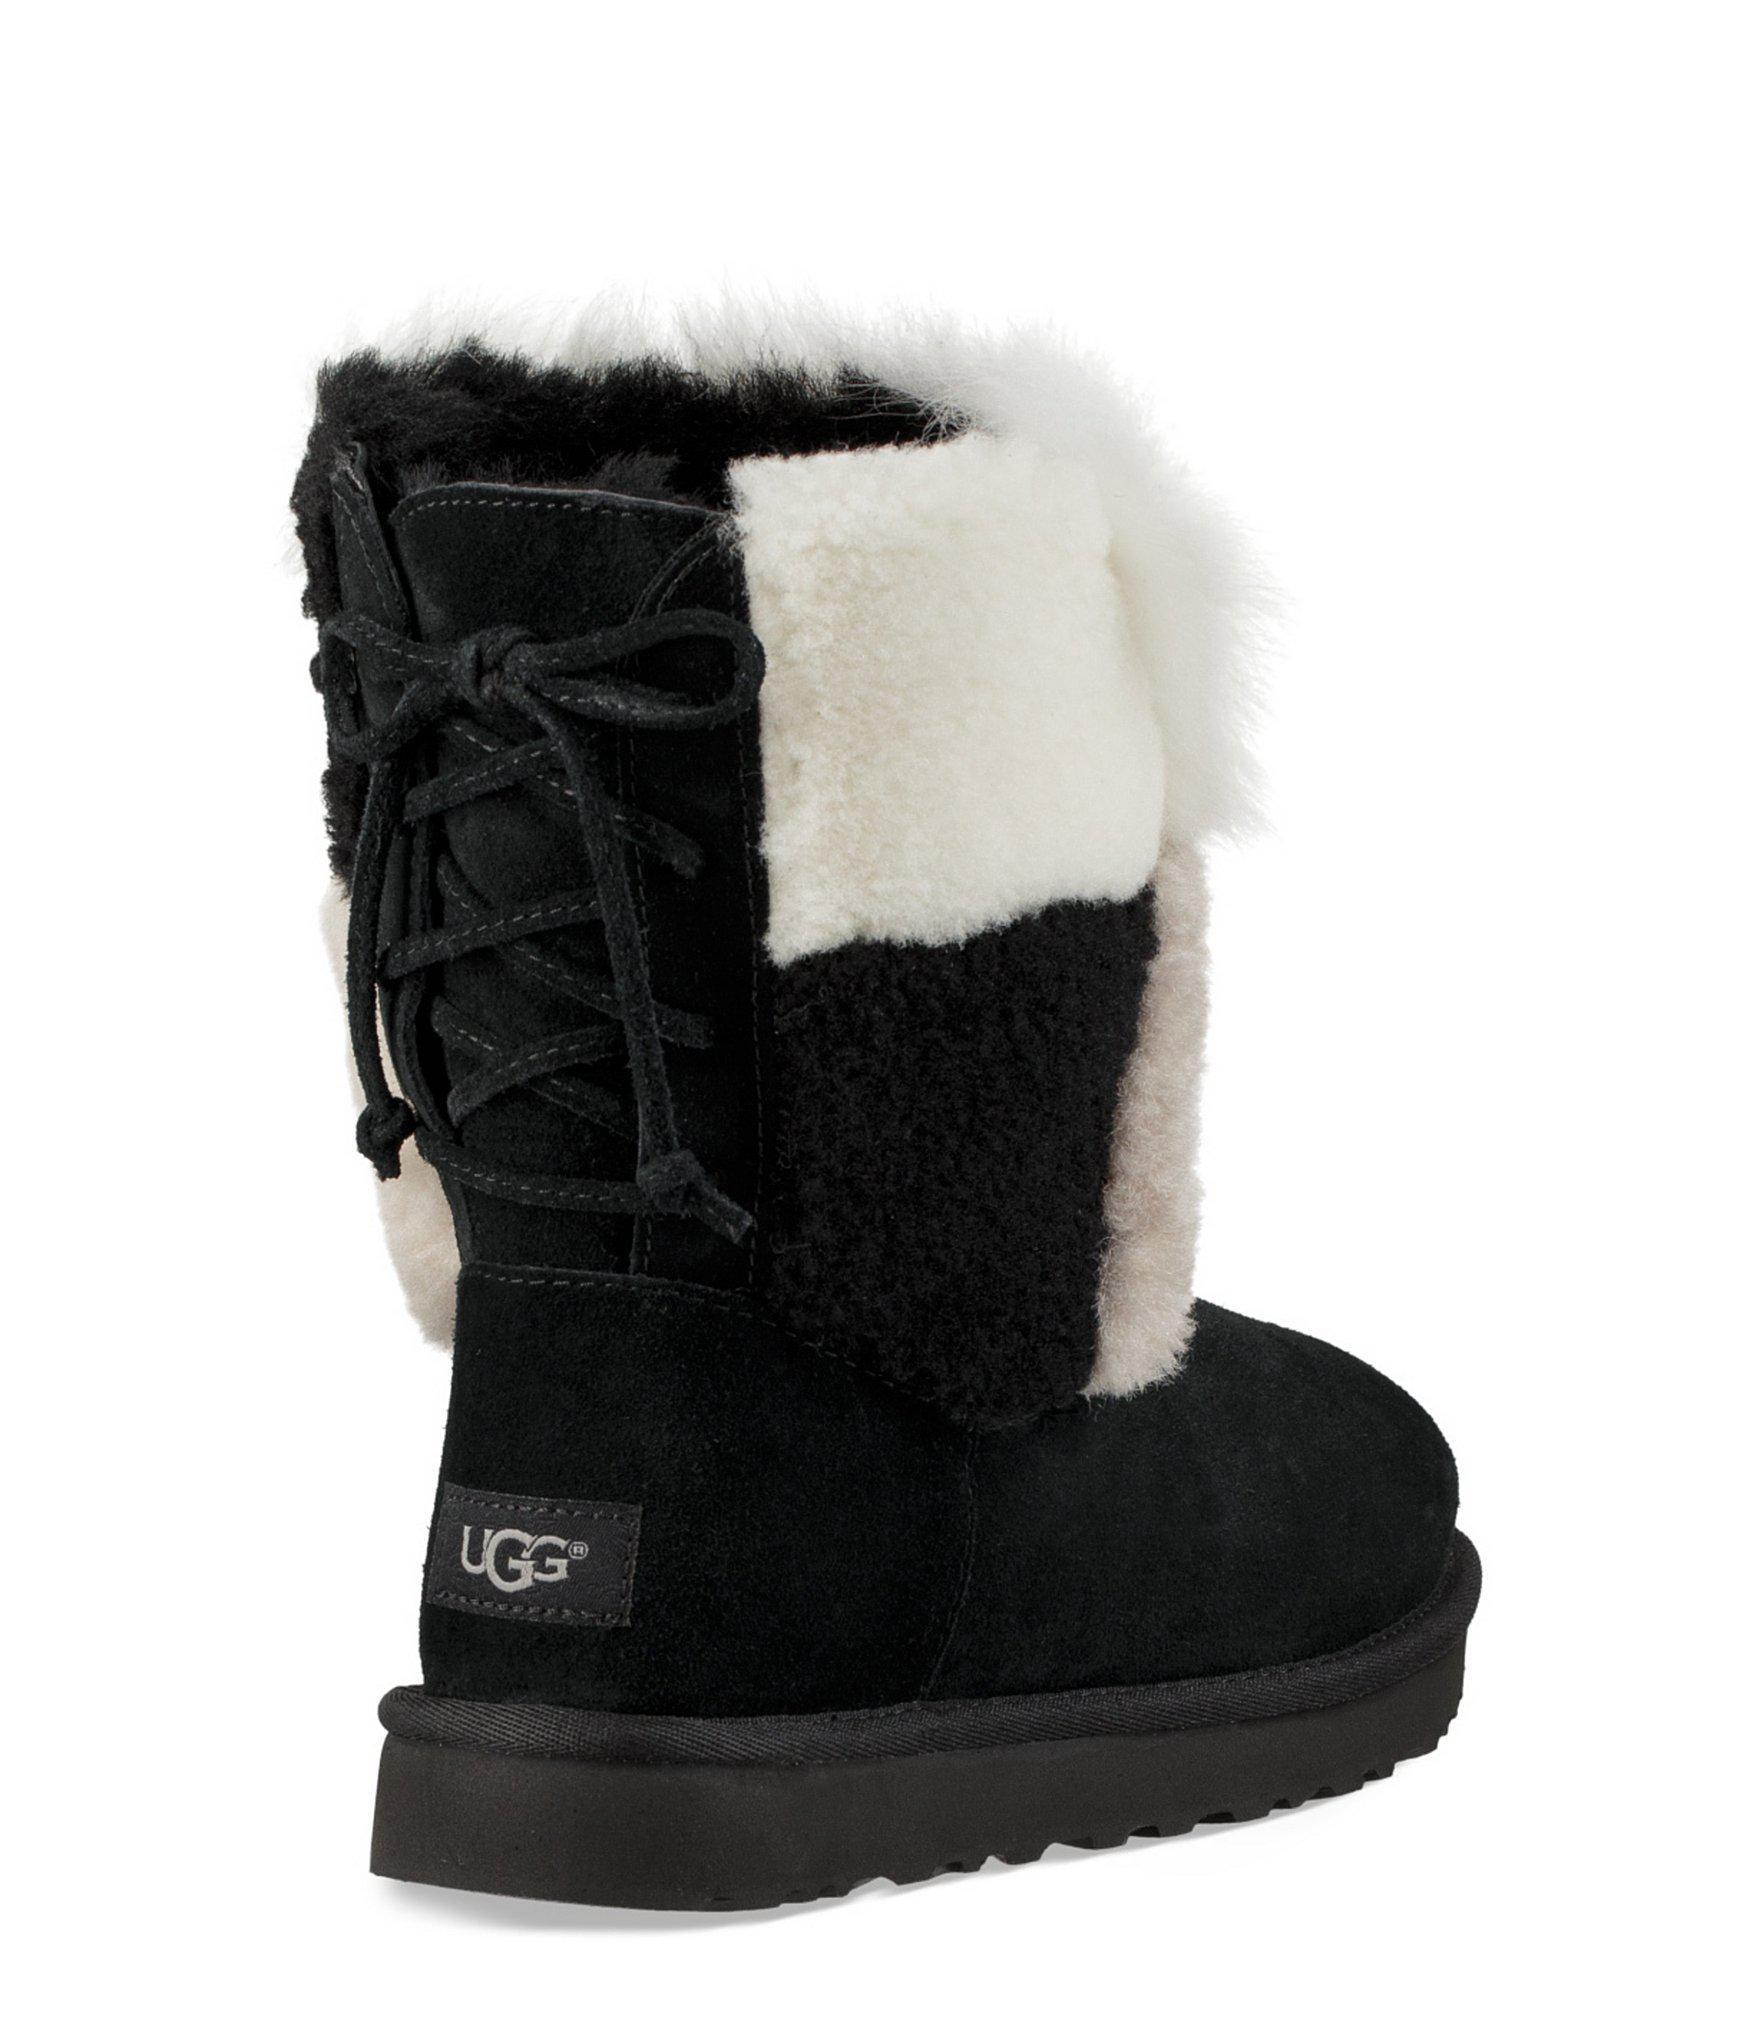 ef9bba9e430 Ugg Black Classic Short Patchwork Fluff Boots